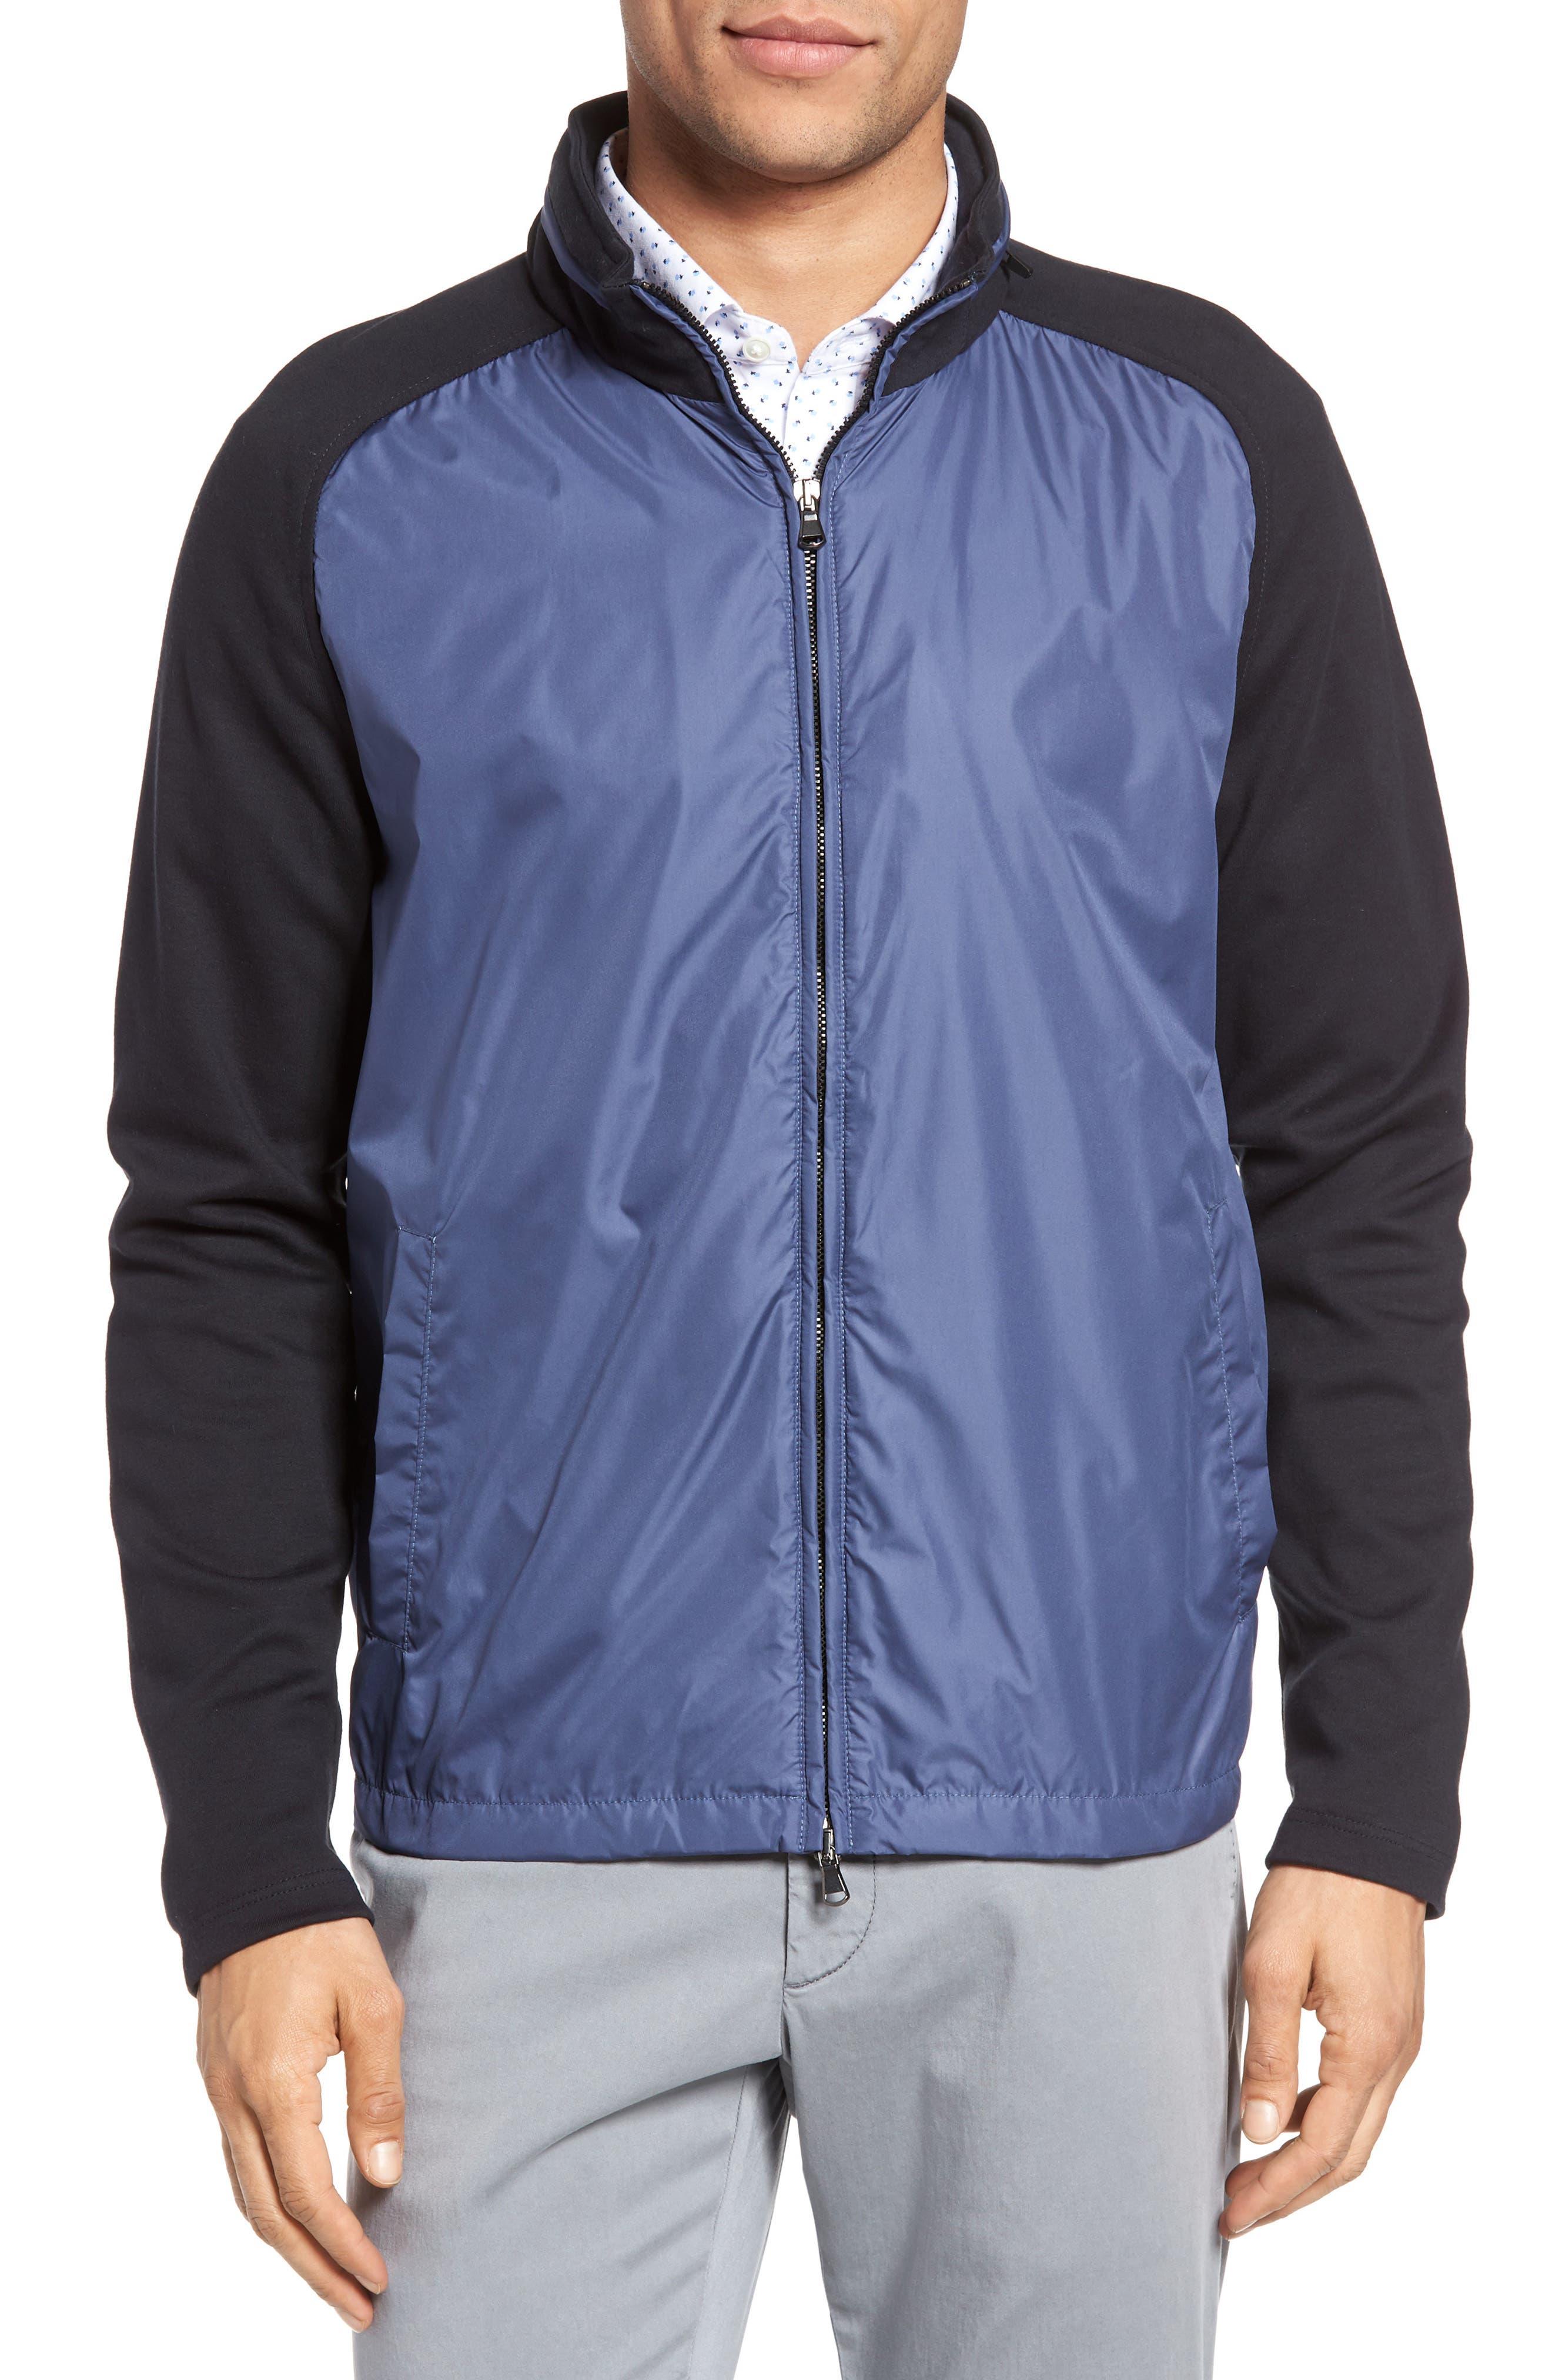 Syconium Mixed Media Zip Front Jacket,                         Main,                         color, 400